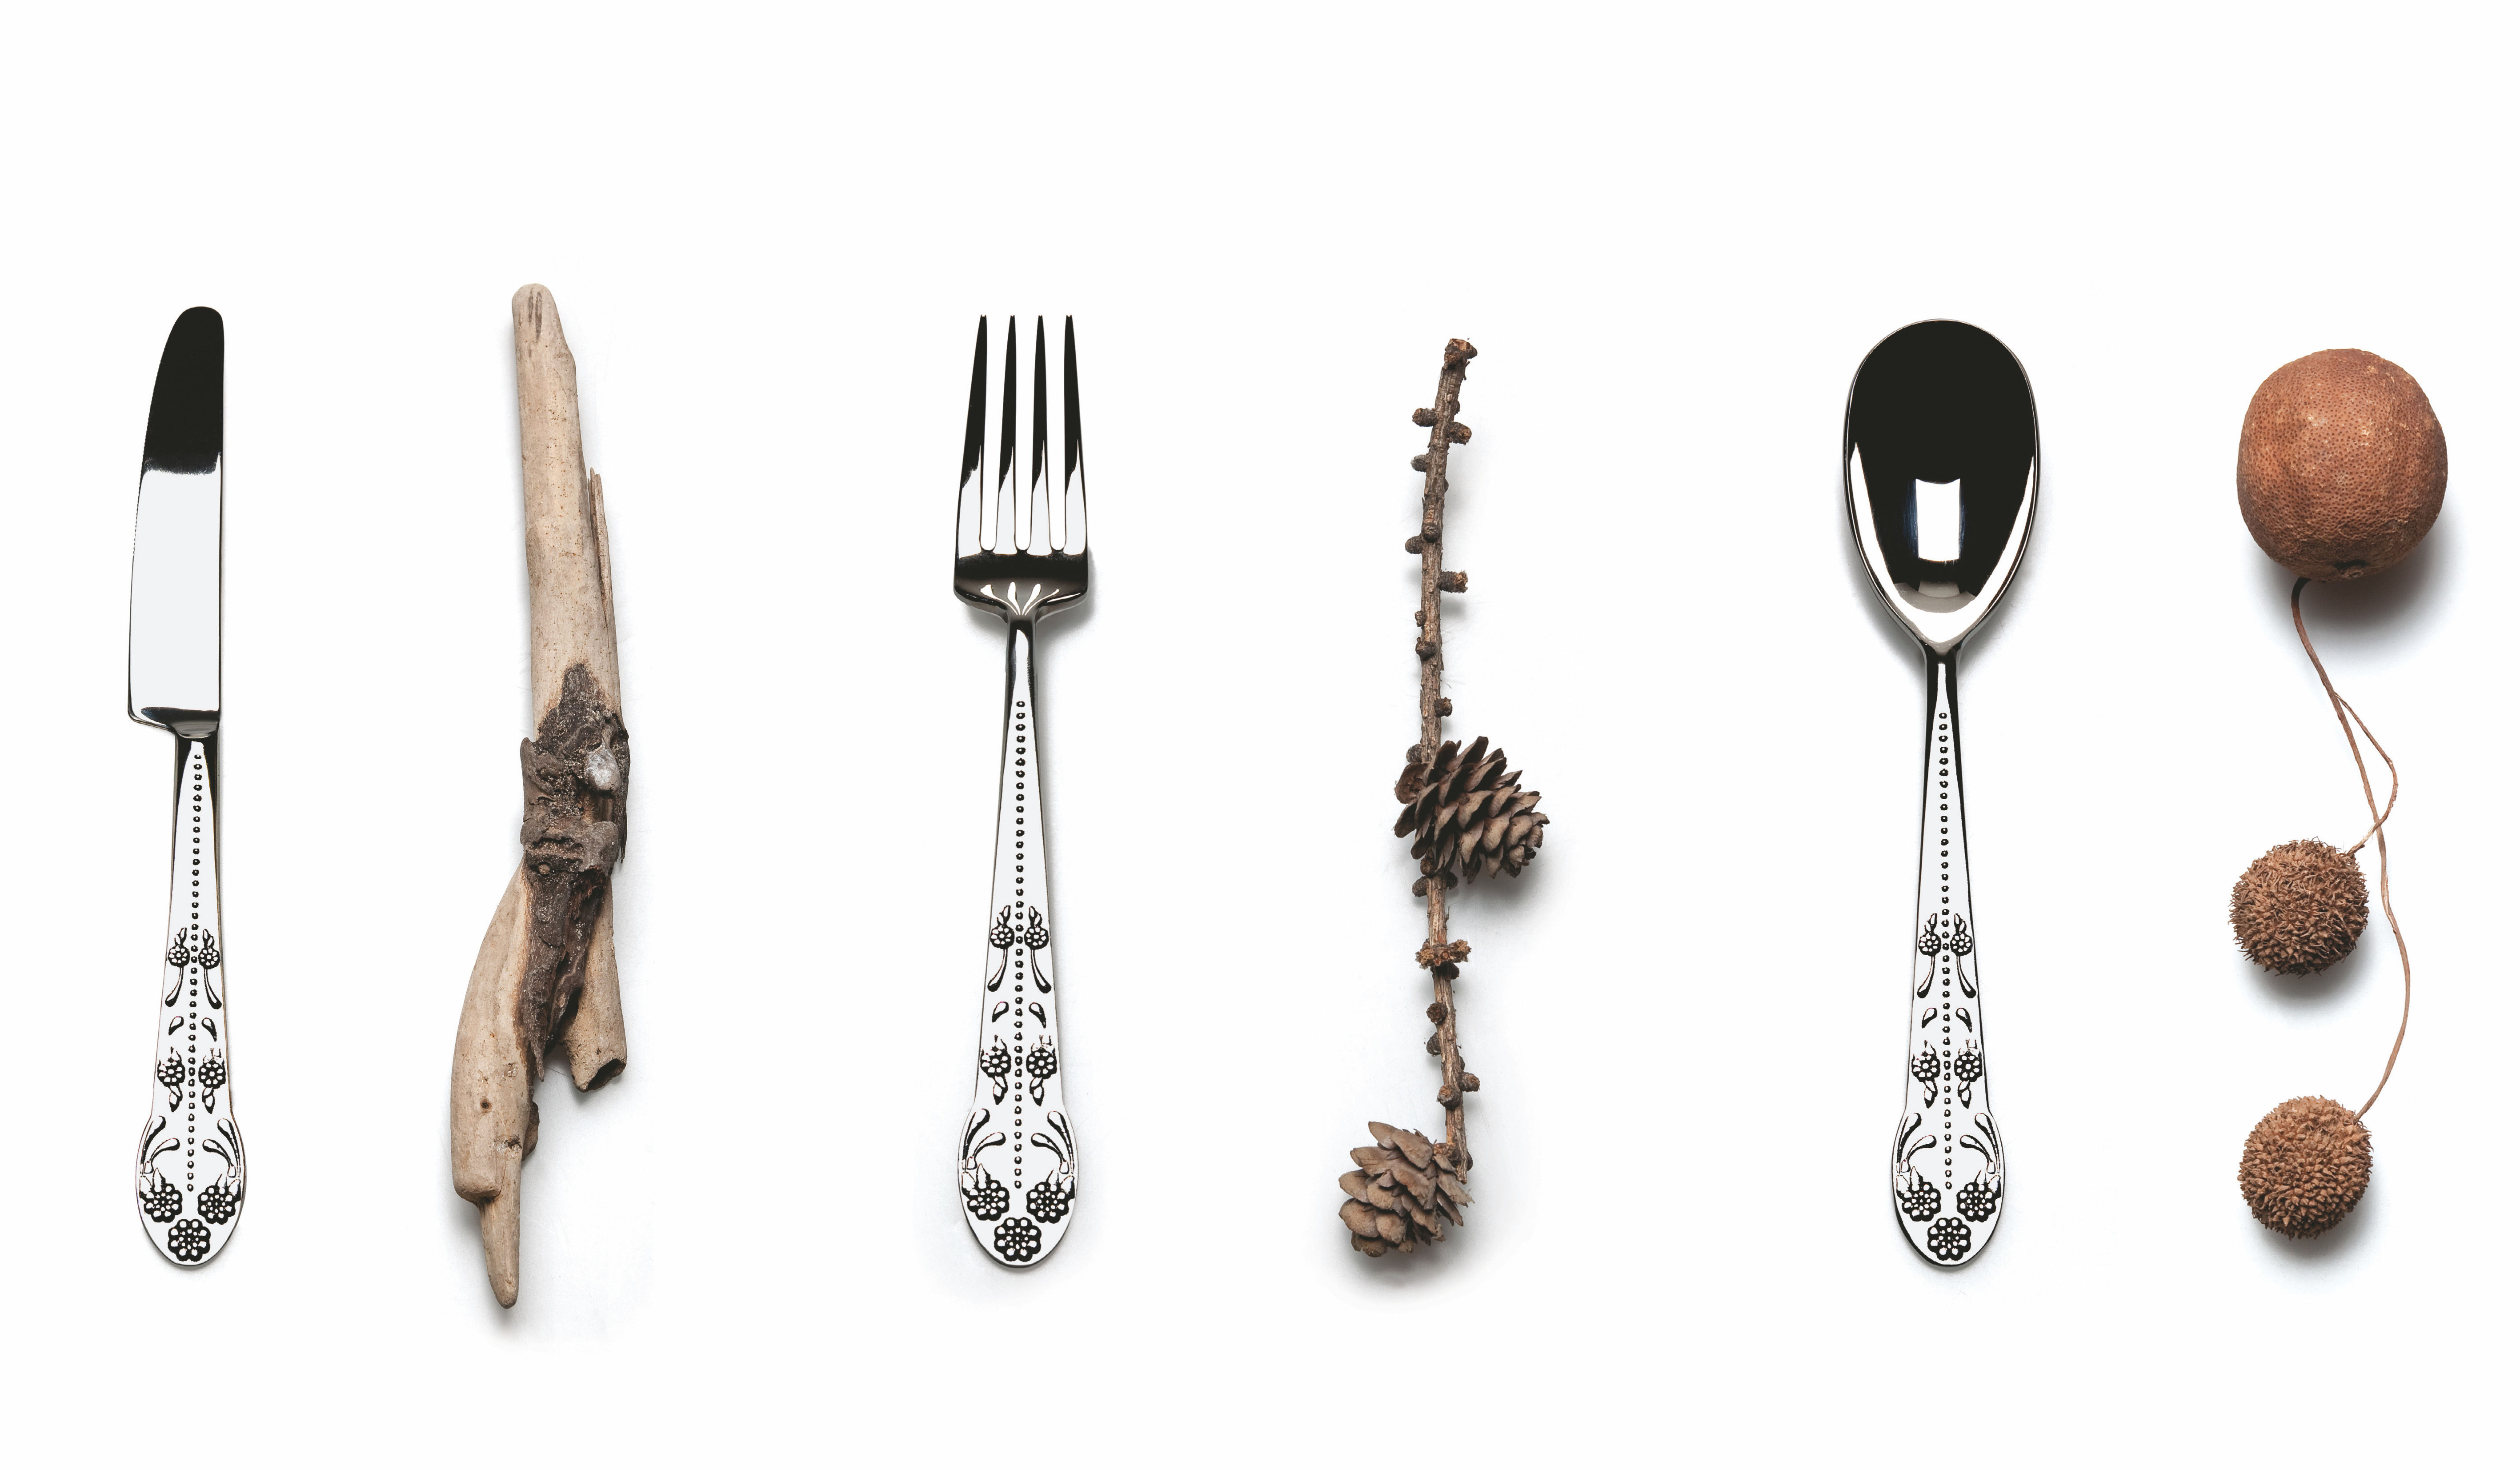 Fourchette asta barocca acier brillant fourchette de for Couverts de table design